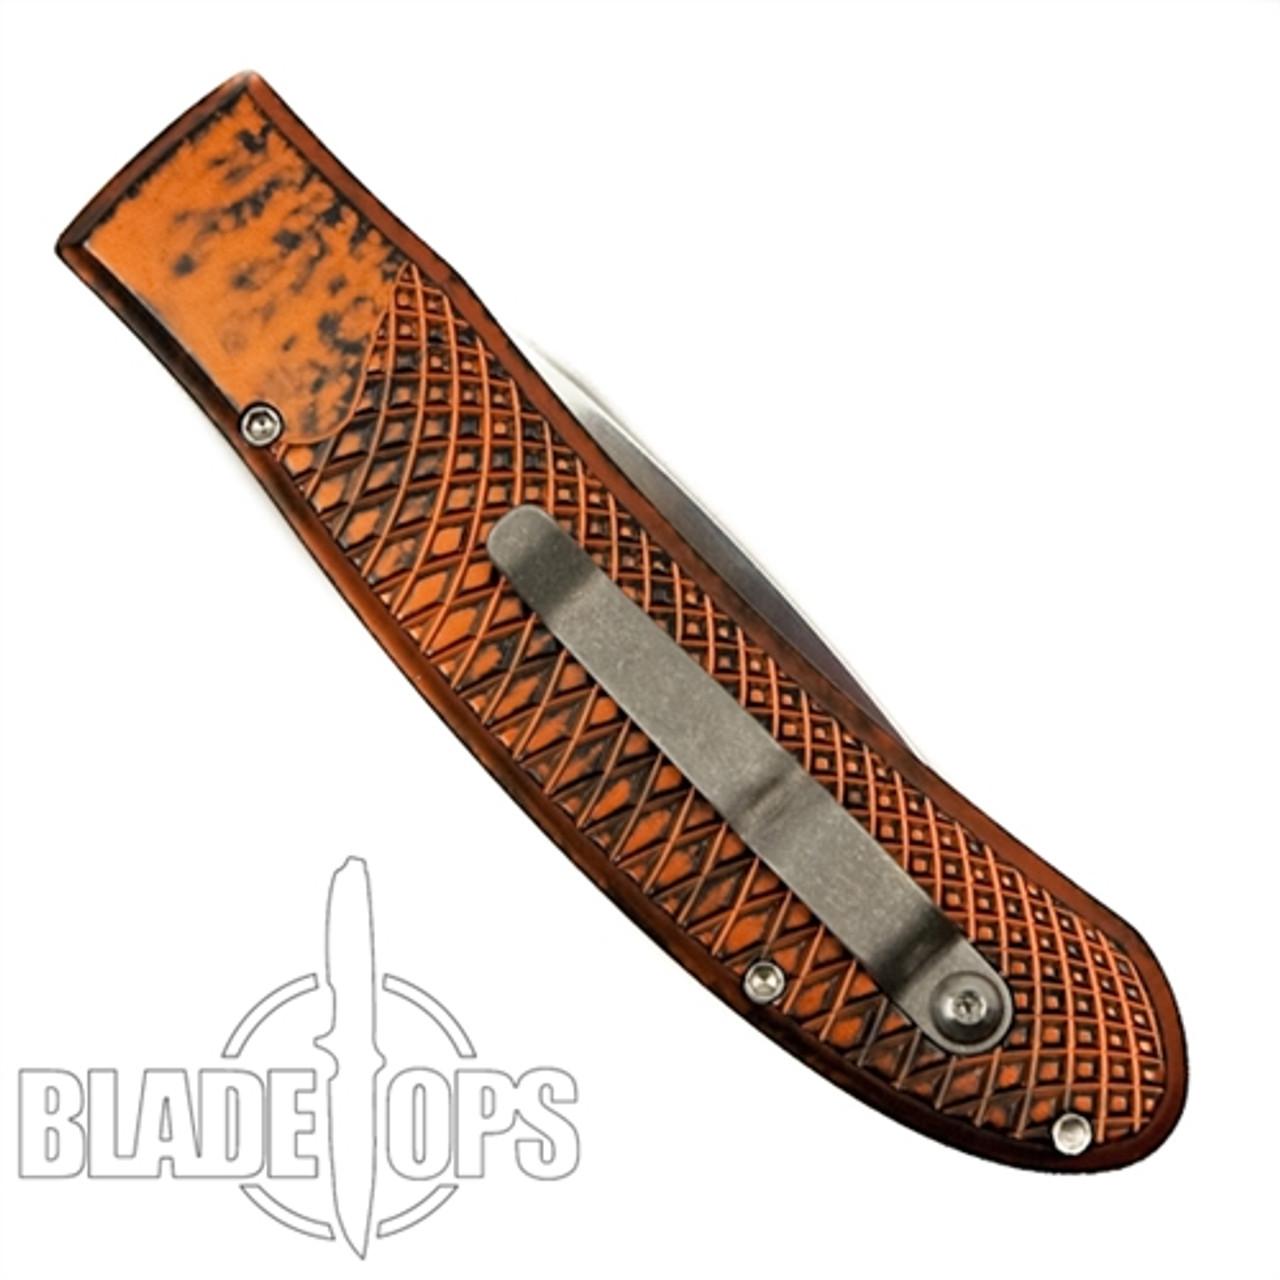 Piranha Orange Toxin Auto Knife, 154CM Mirror Blade